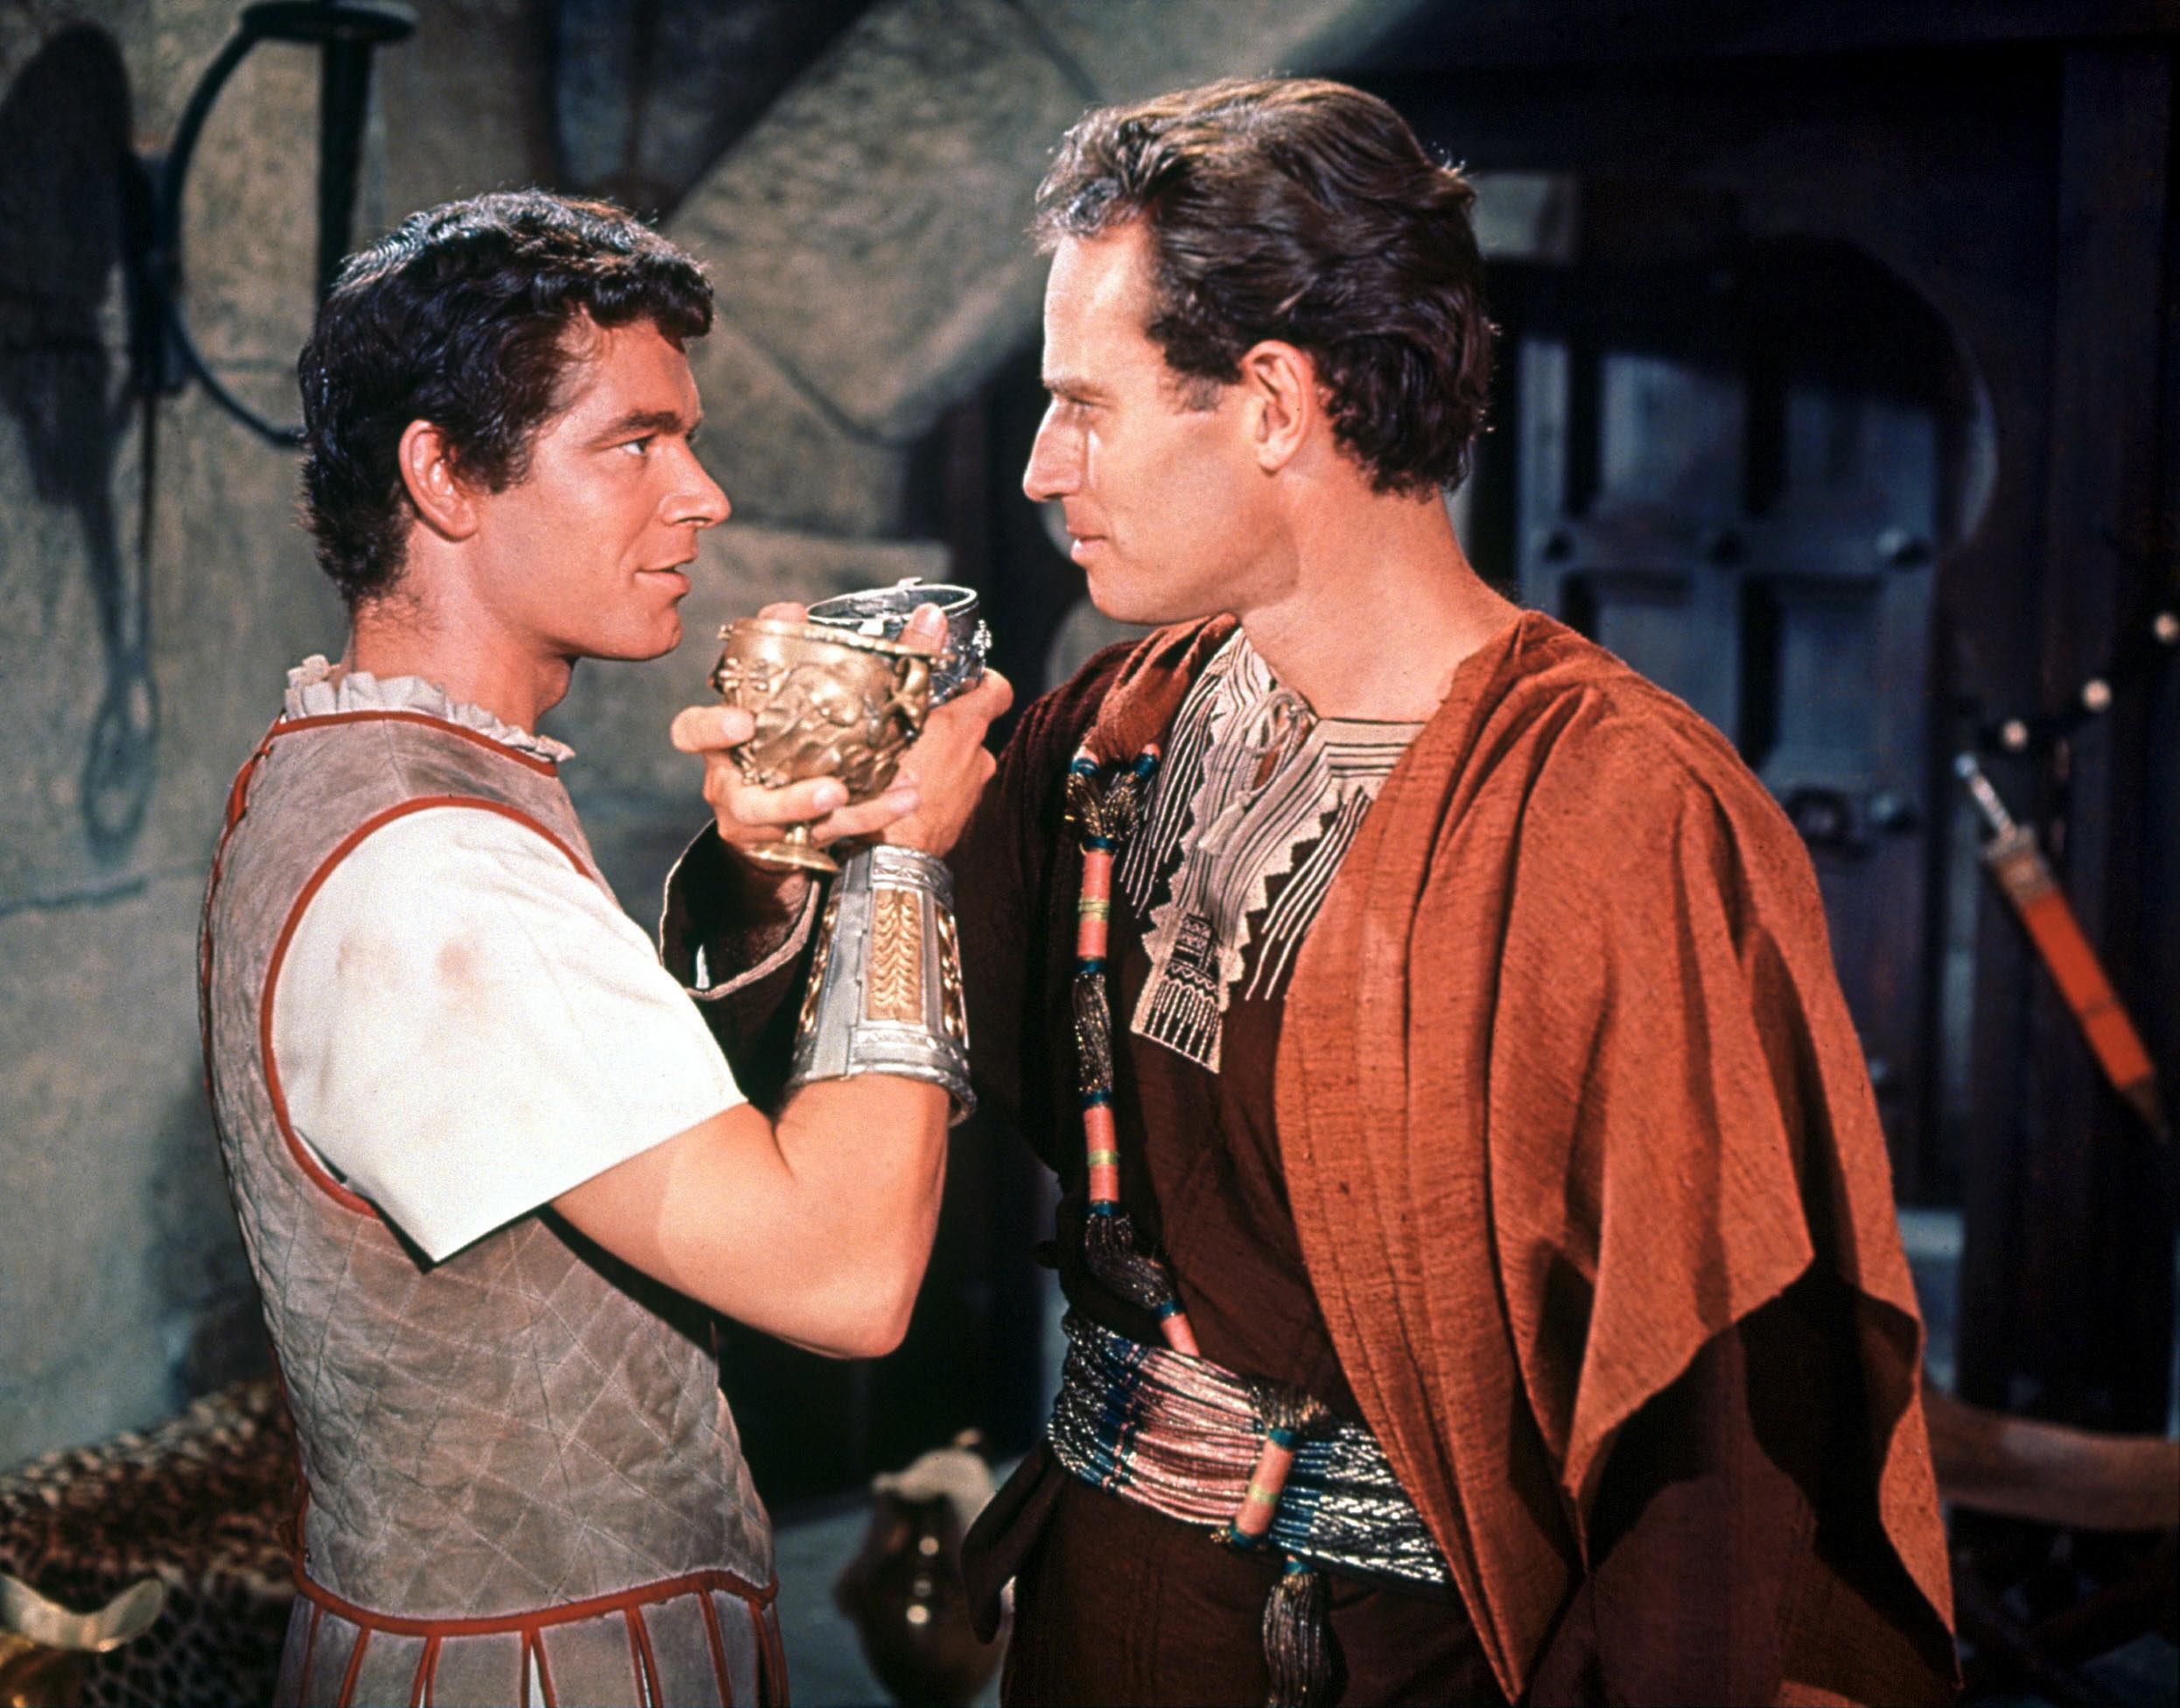 Charlton Heston in Ben-Hur With Stephen Boyd (L)